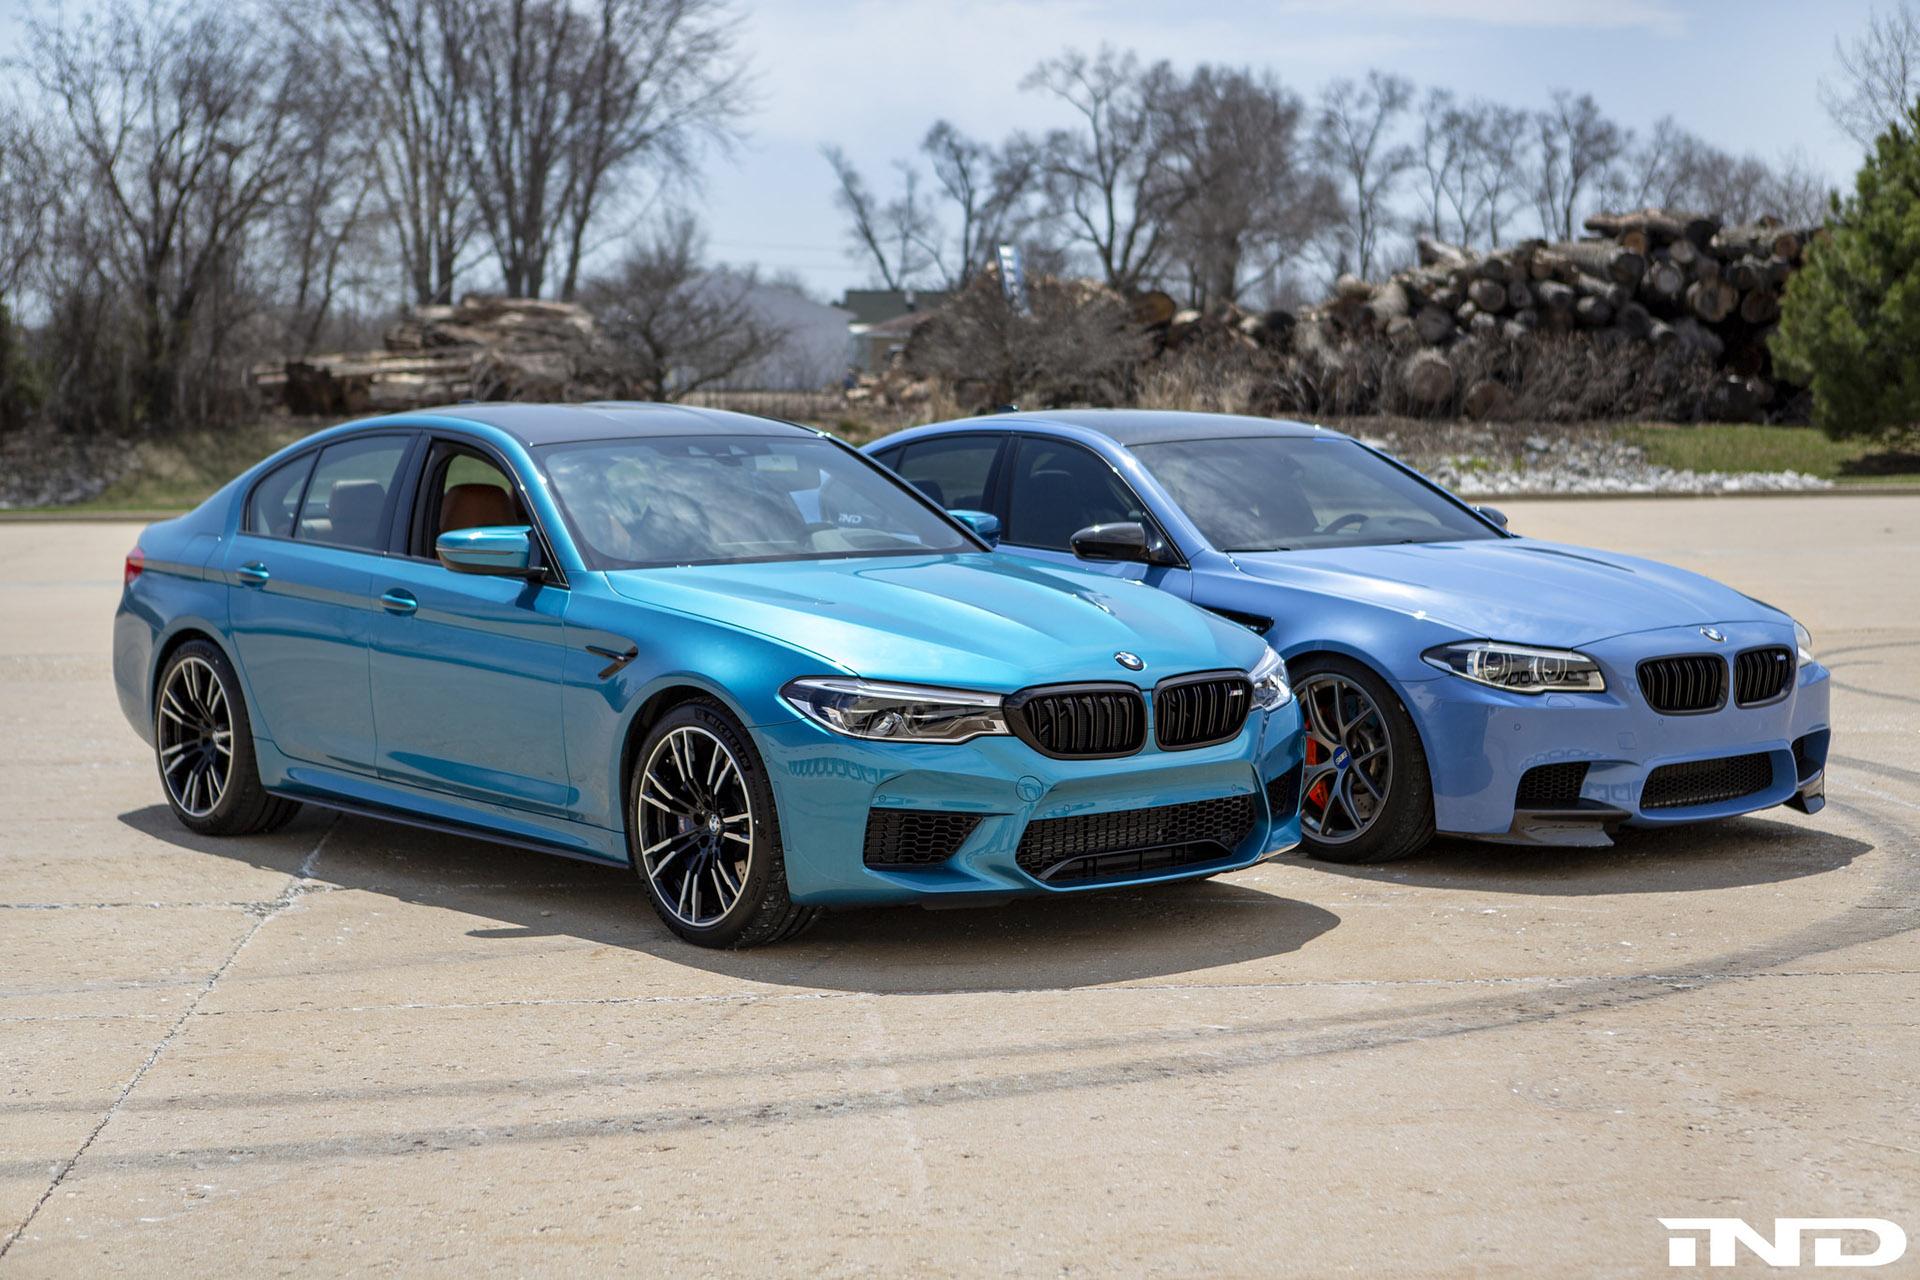 IND DIstribution BMW F10 M5 Yas Marina Blue vs BMWF90 M5 Snapper Rocks Blue 1